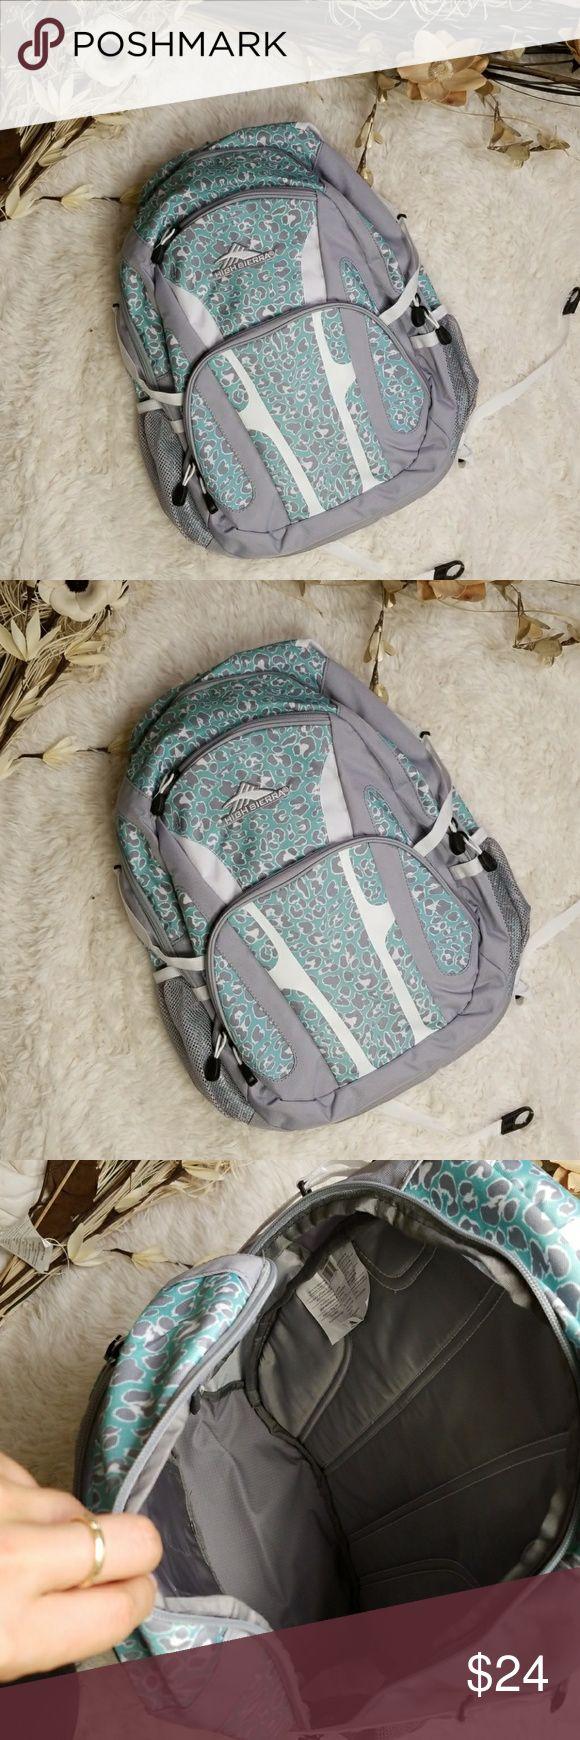 High Sierra Backpack Brand new with tag   Dimensions:   19.5 × 13 × 8 in   MQ000021518600 High Sierra Bags Backpacks